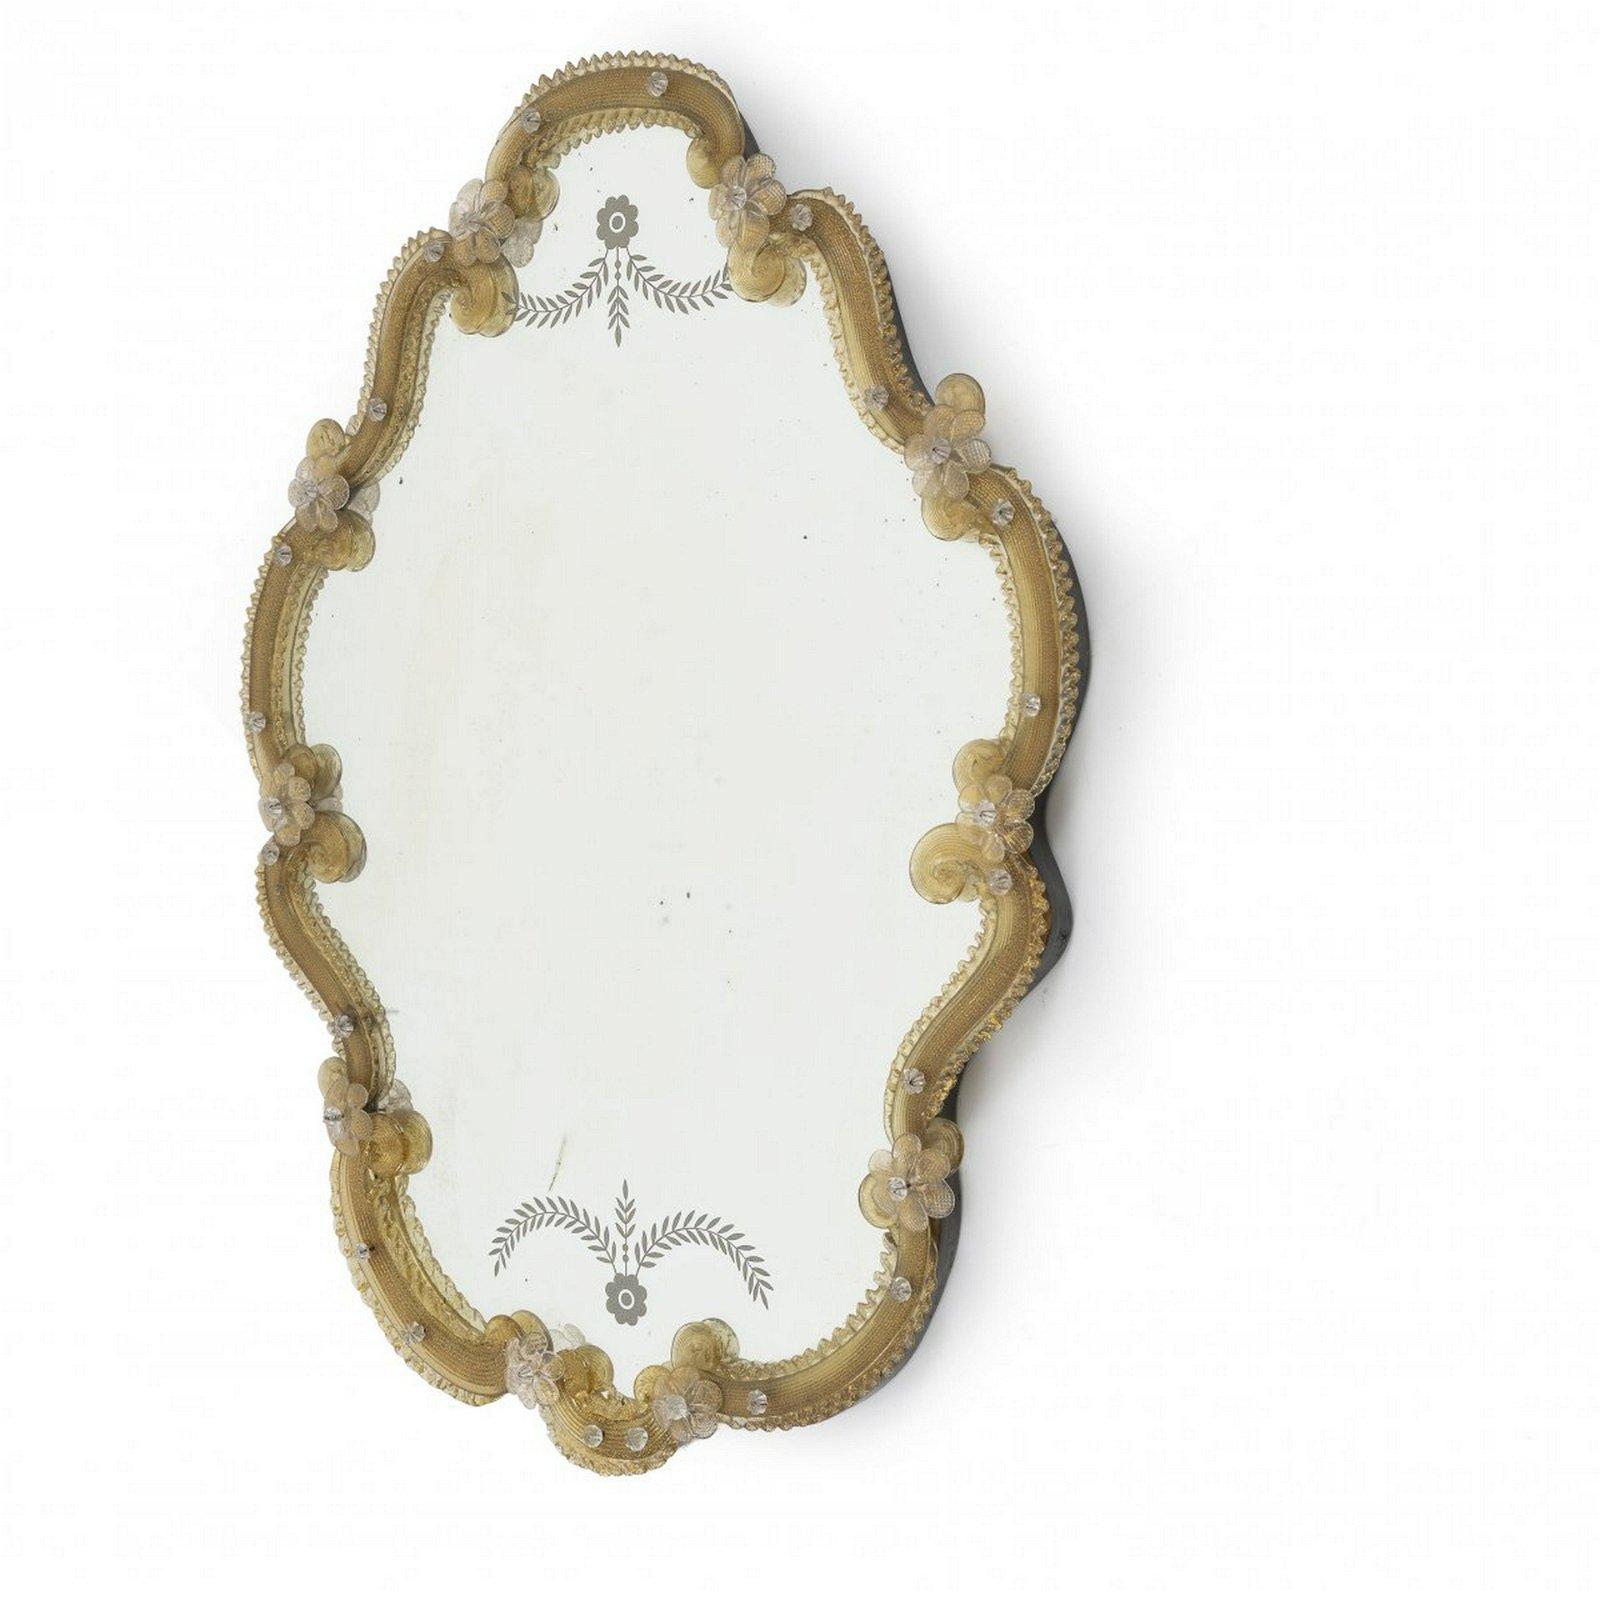 Barovier & Toso, Murano, Mirror, 1920s